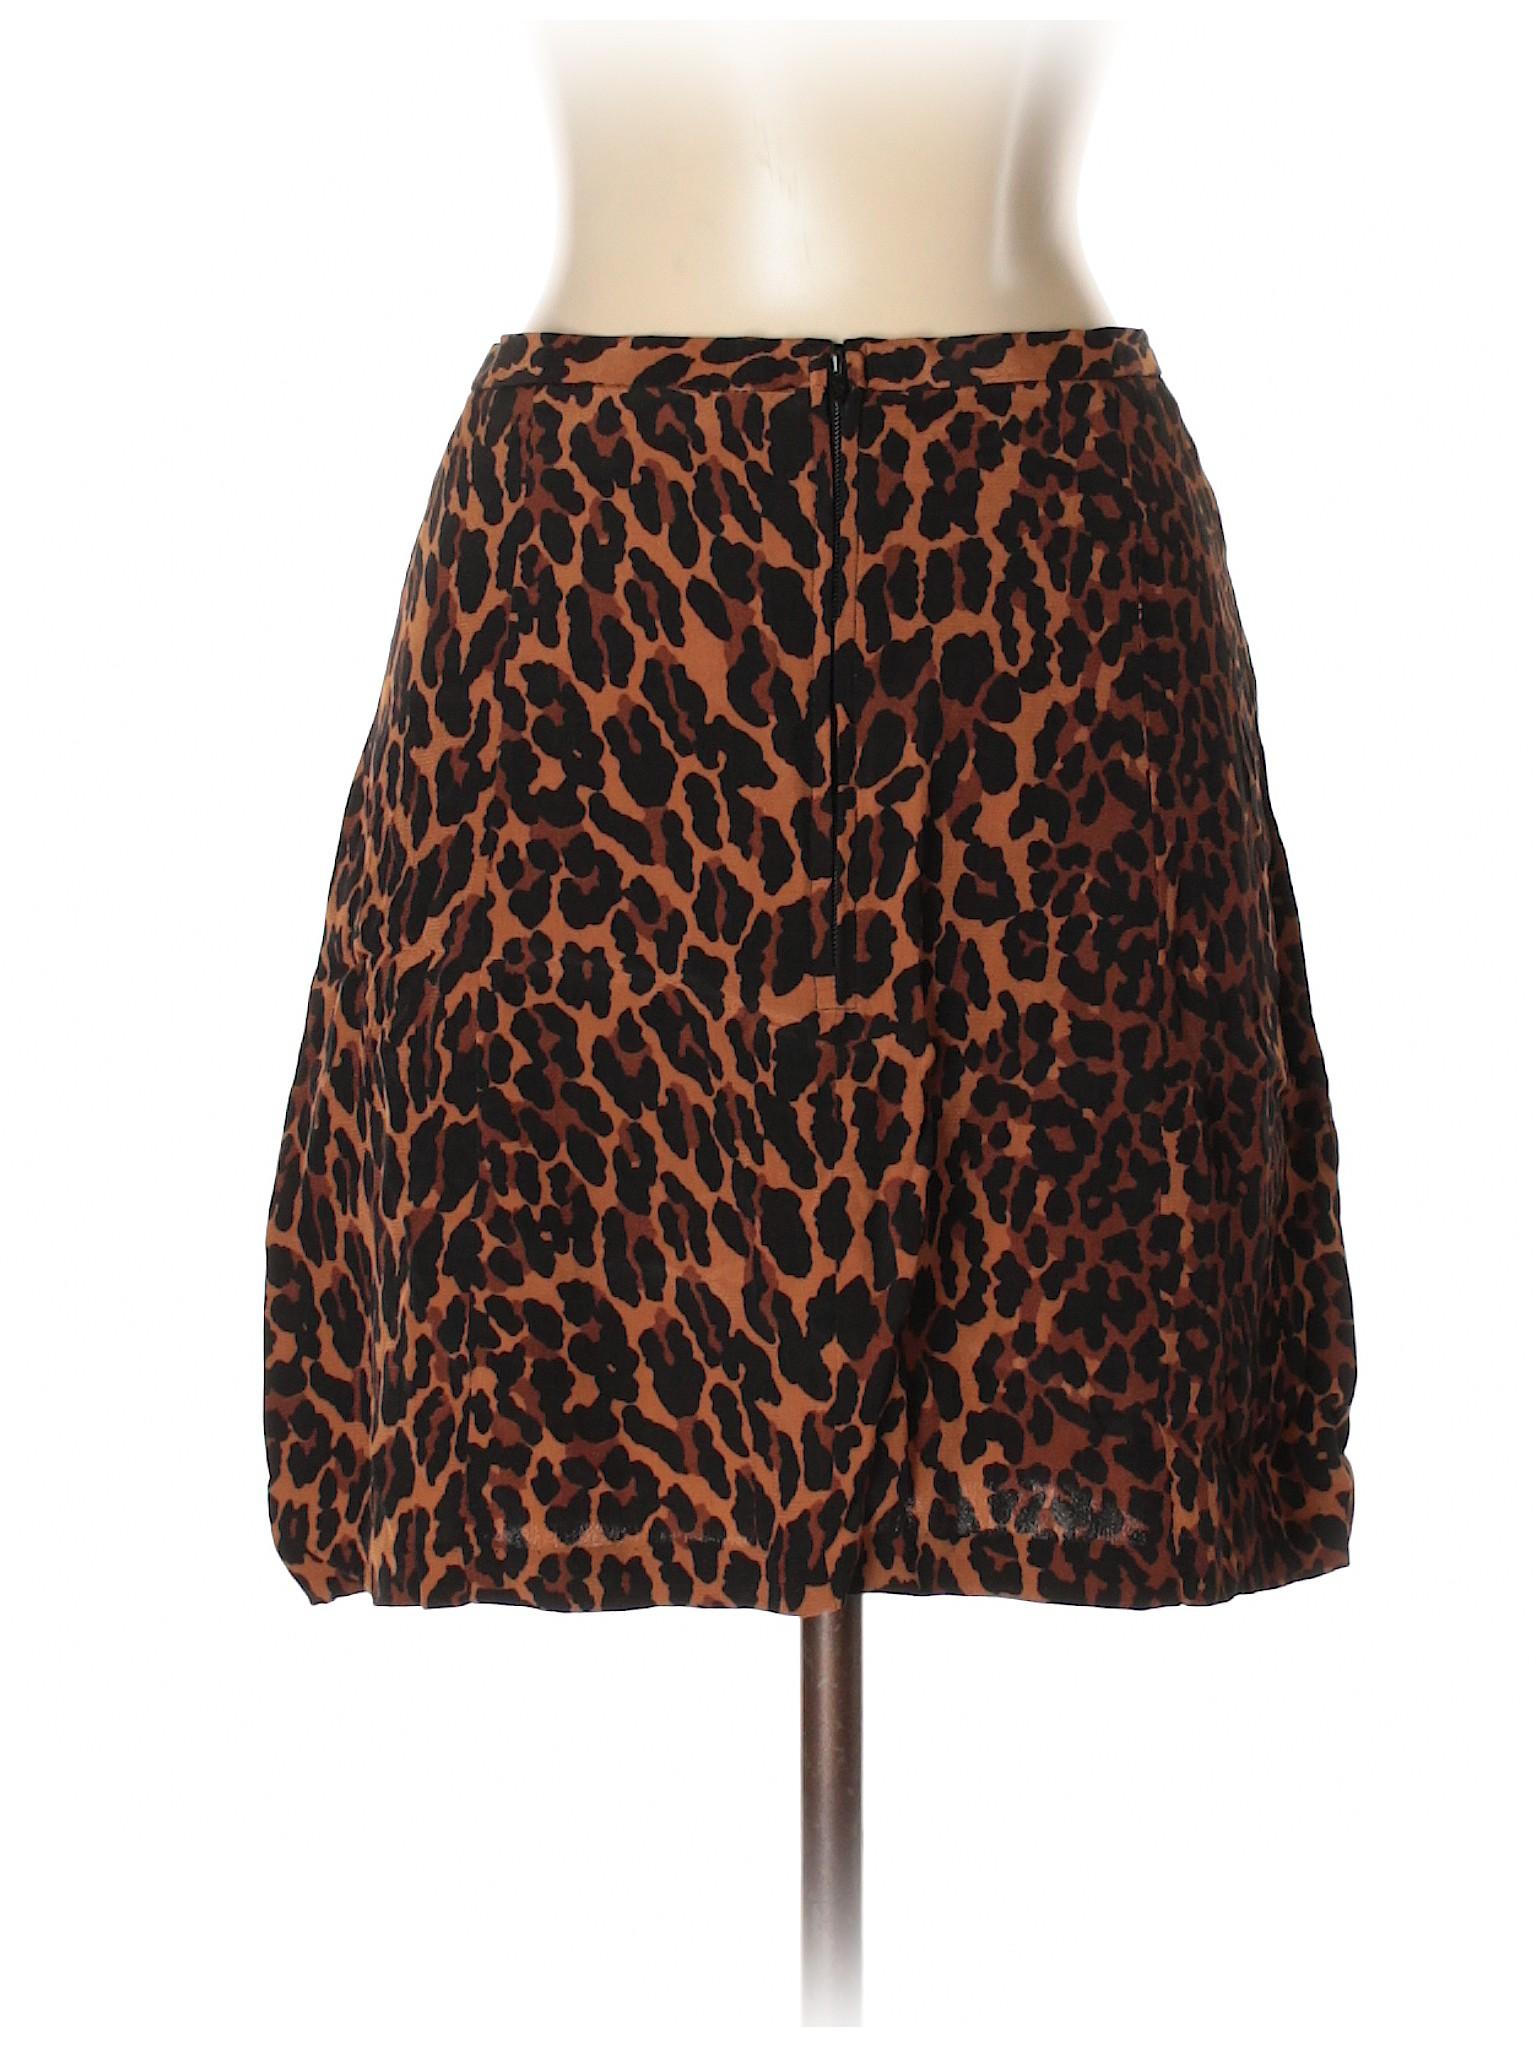 Skirt Boutique Casual Betsey Betsey Johnson Boutique CZYFwqv